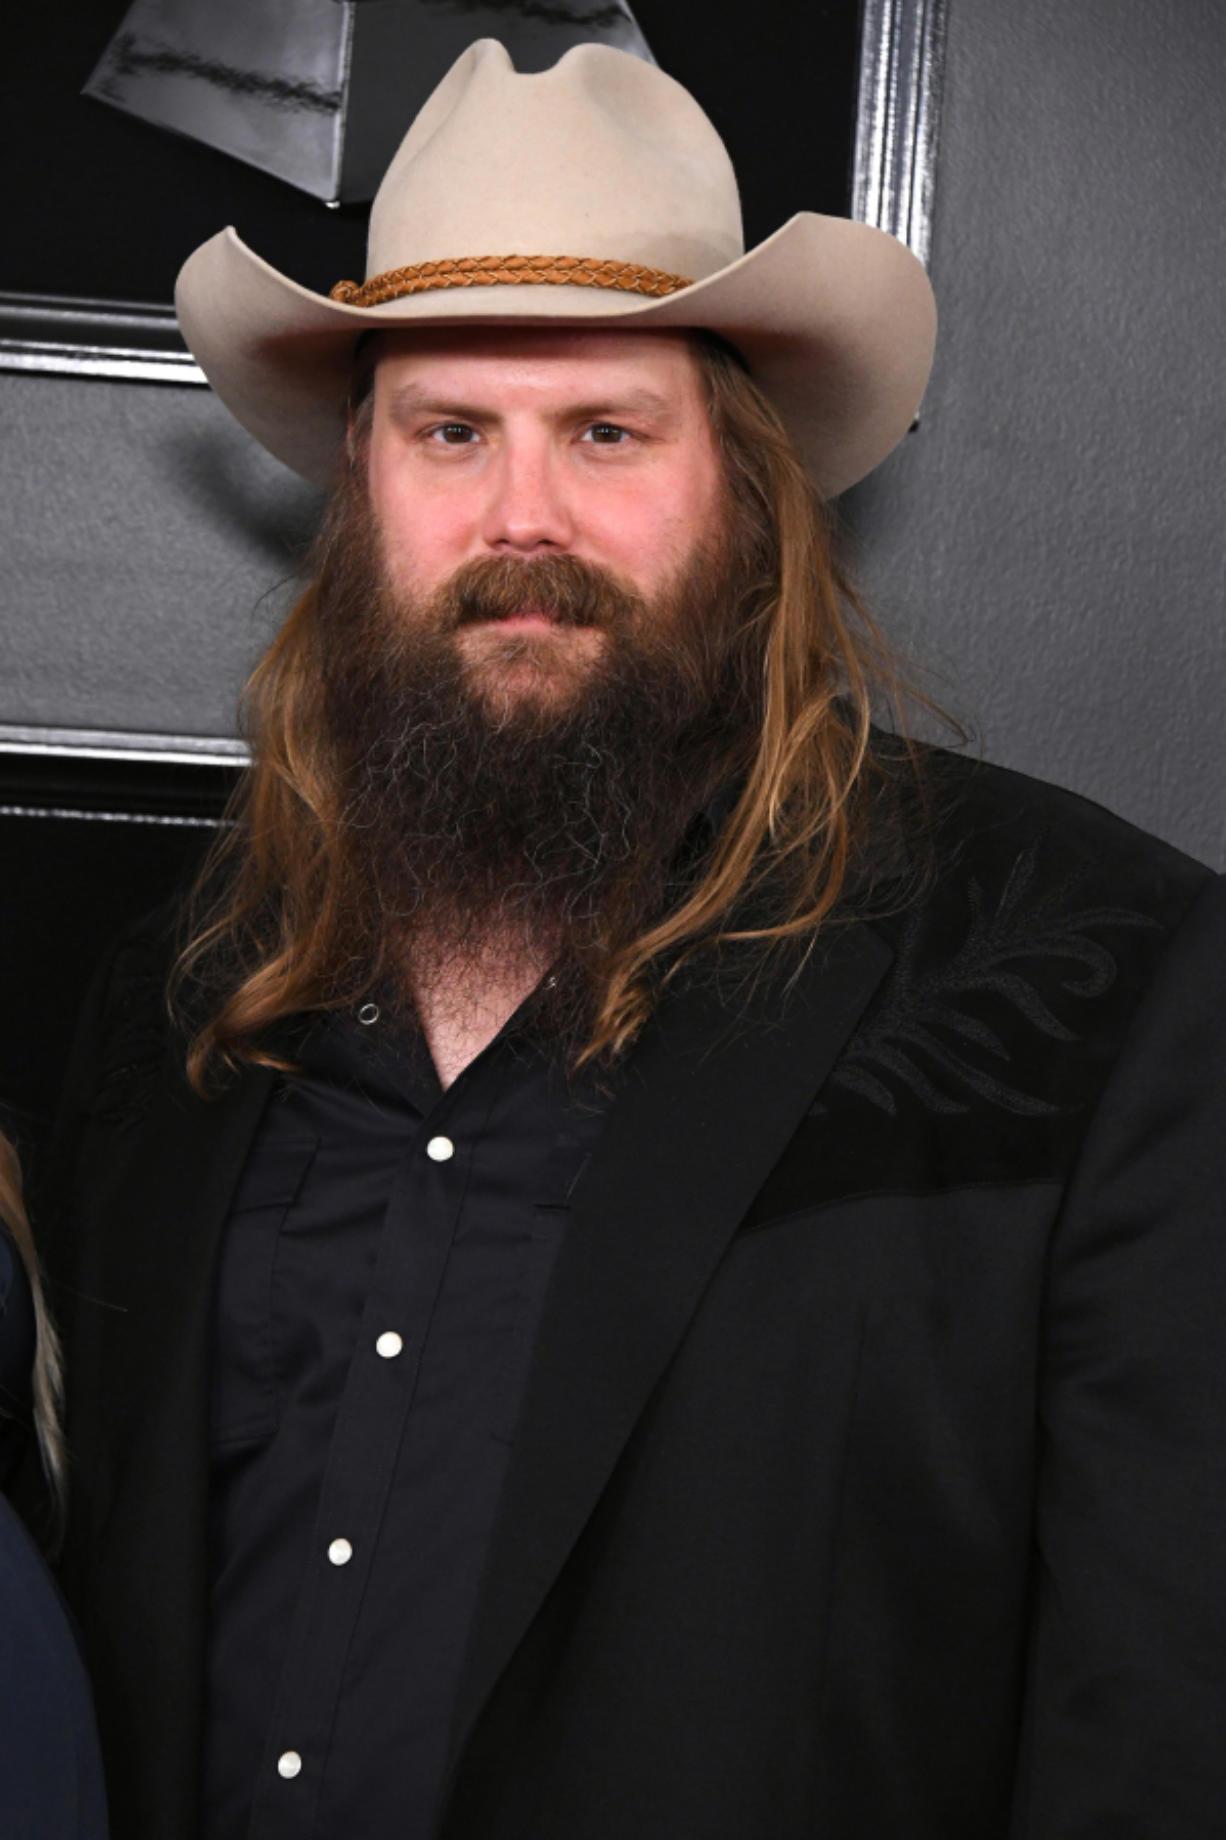 Chris Stapleton attends the 61st Annual Grammy Awards at Staples Center on Feb. 10, 2019 in Los Angeles, California. (Jon Kopaloff/Getty Images/TNS) (Allen J.